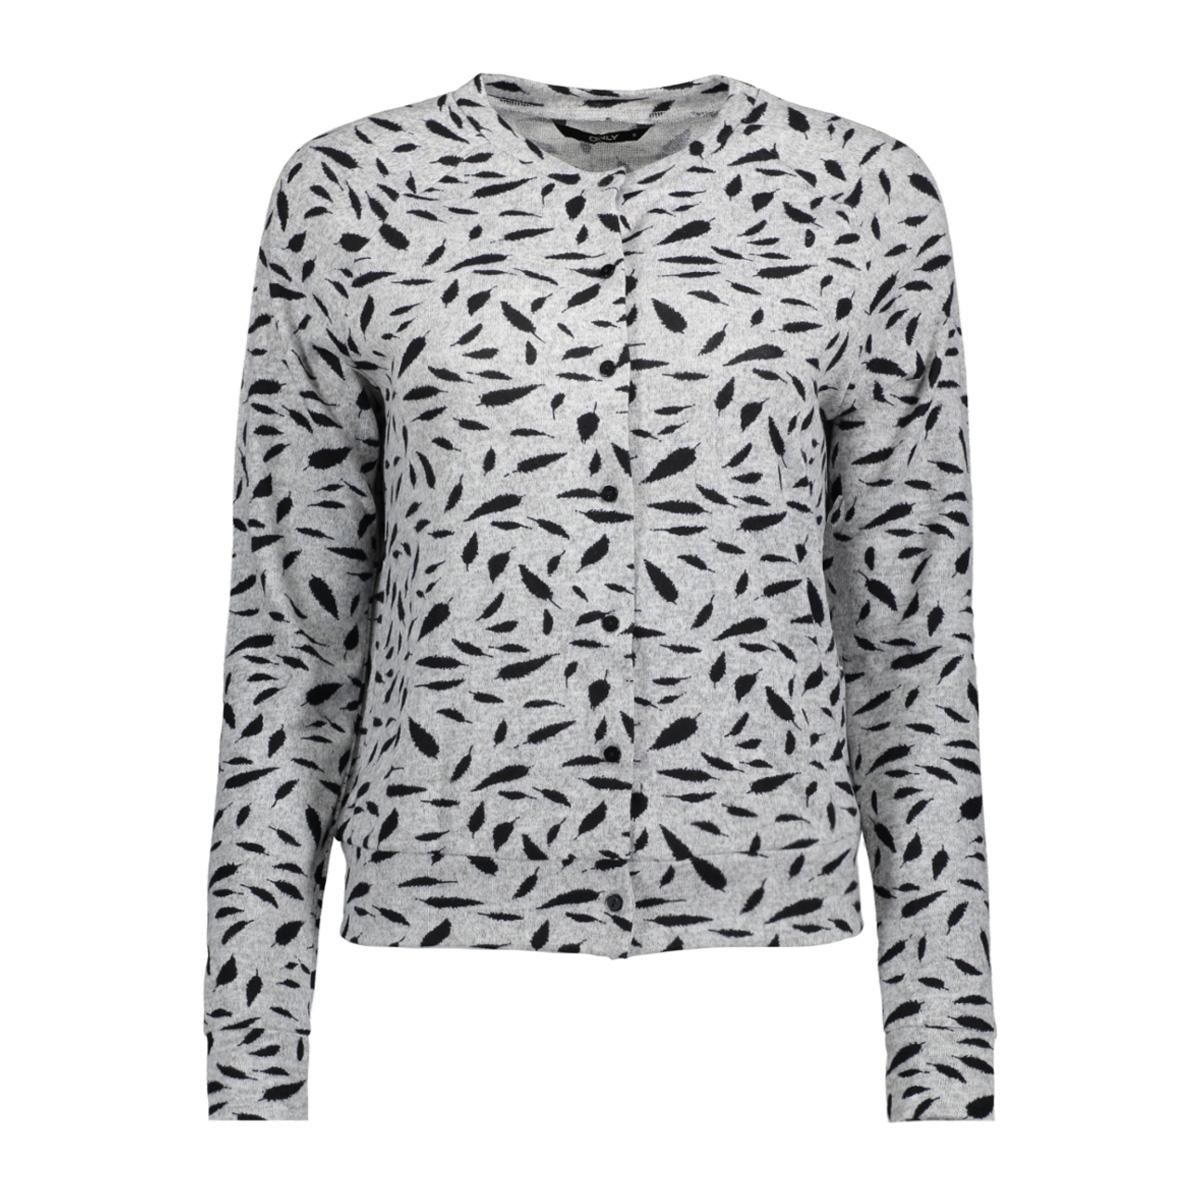 onlelcos megan cardigan l/s top jrs 15155758 only vest light grey mela/black feat